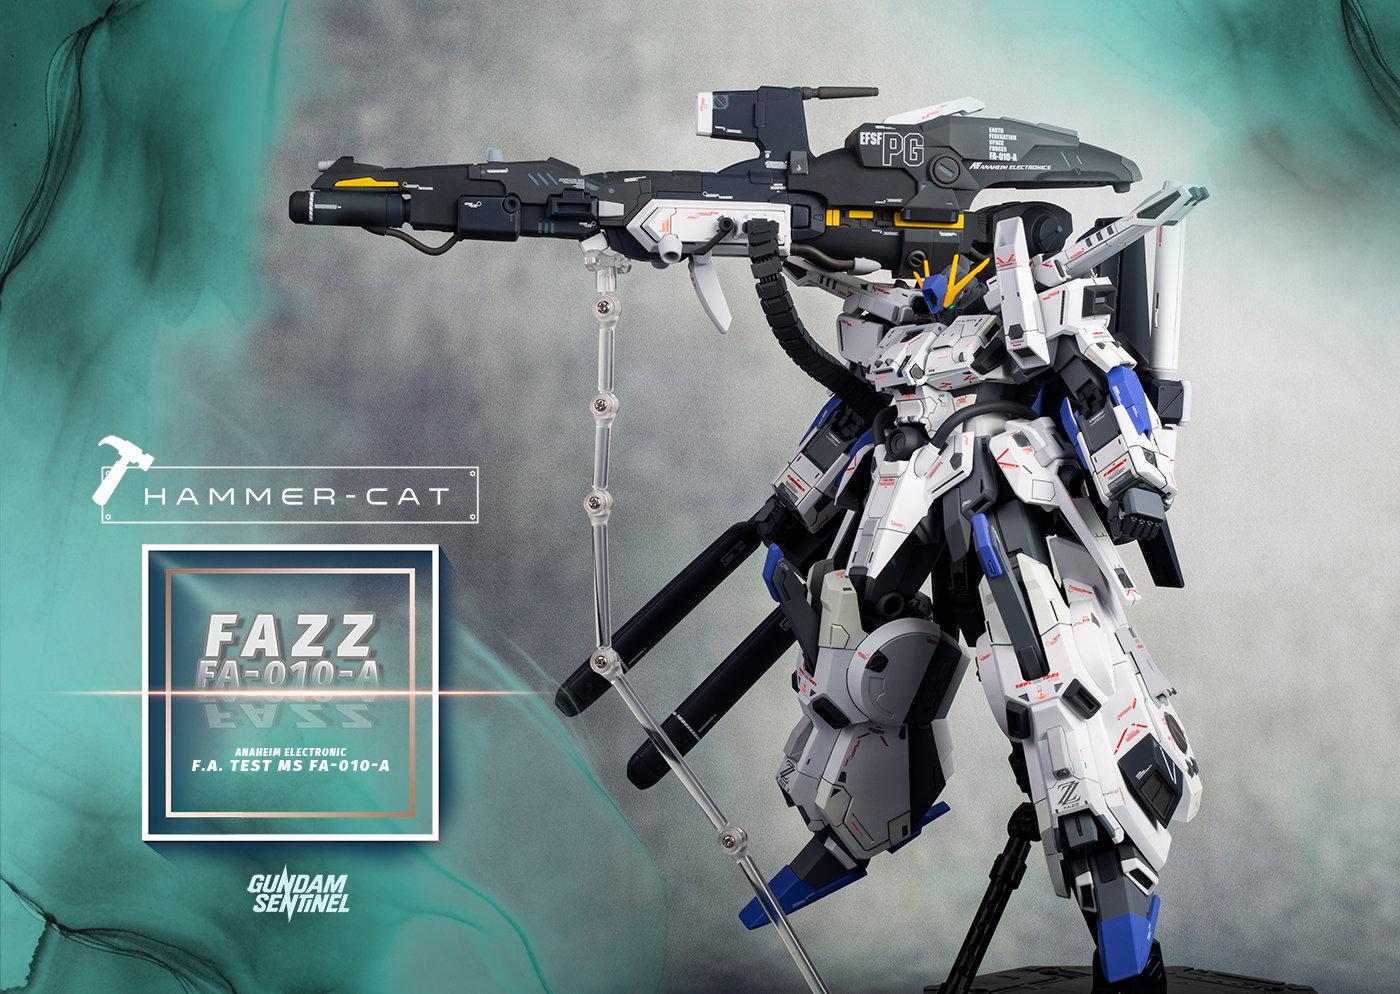 G748_MG_FAZZ_info_003.jpg